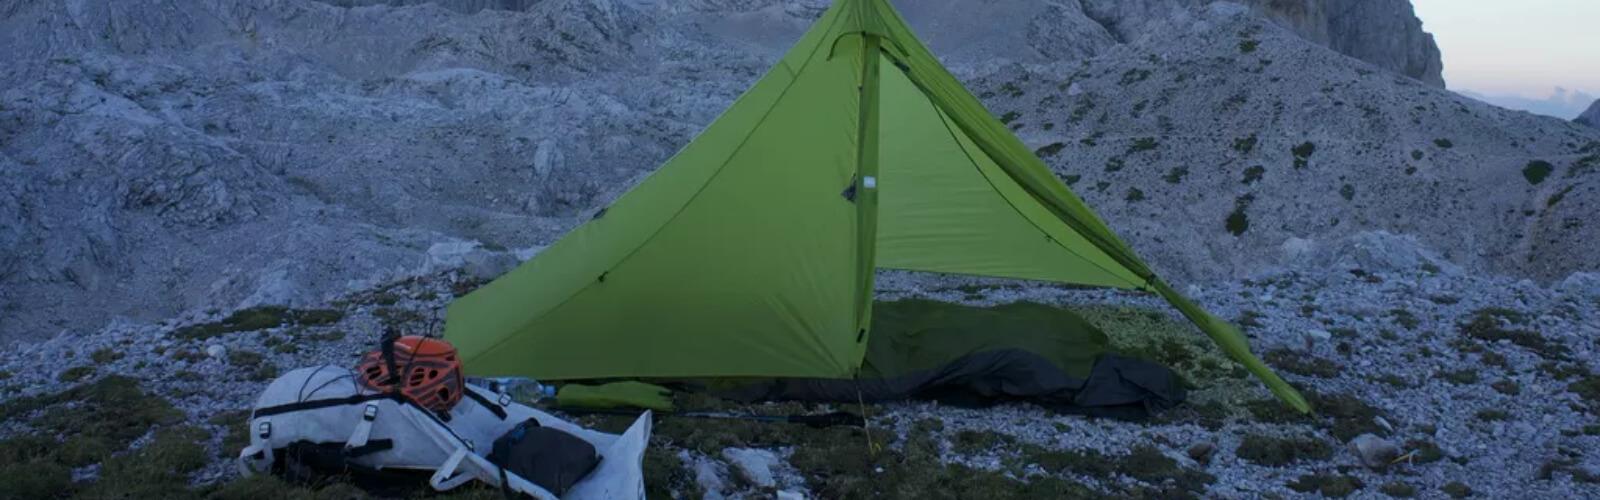 Trekking-Ultraleicht-Zelt